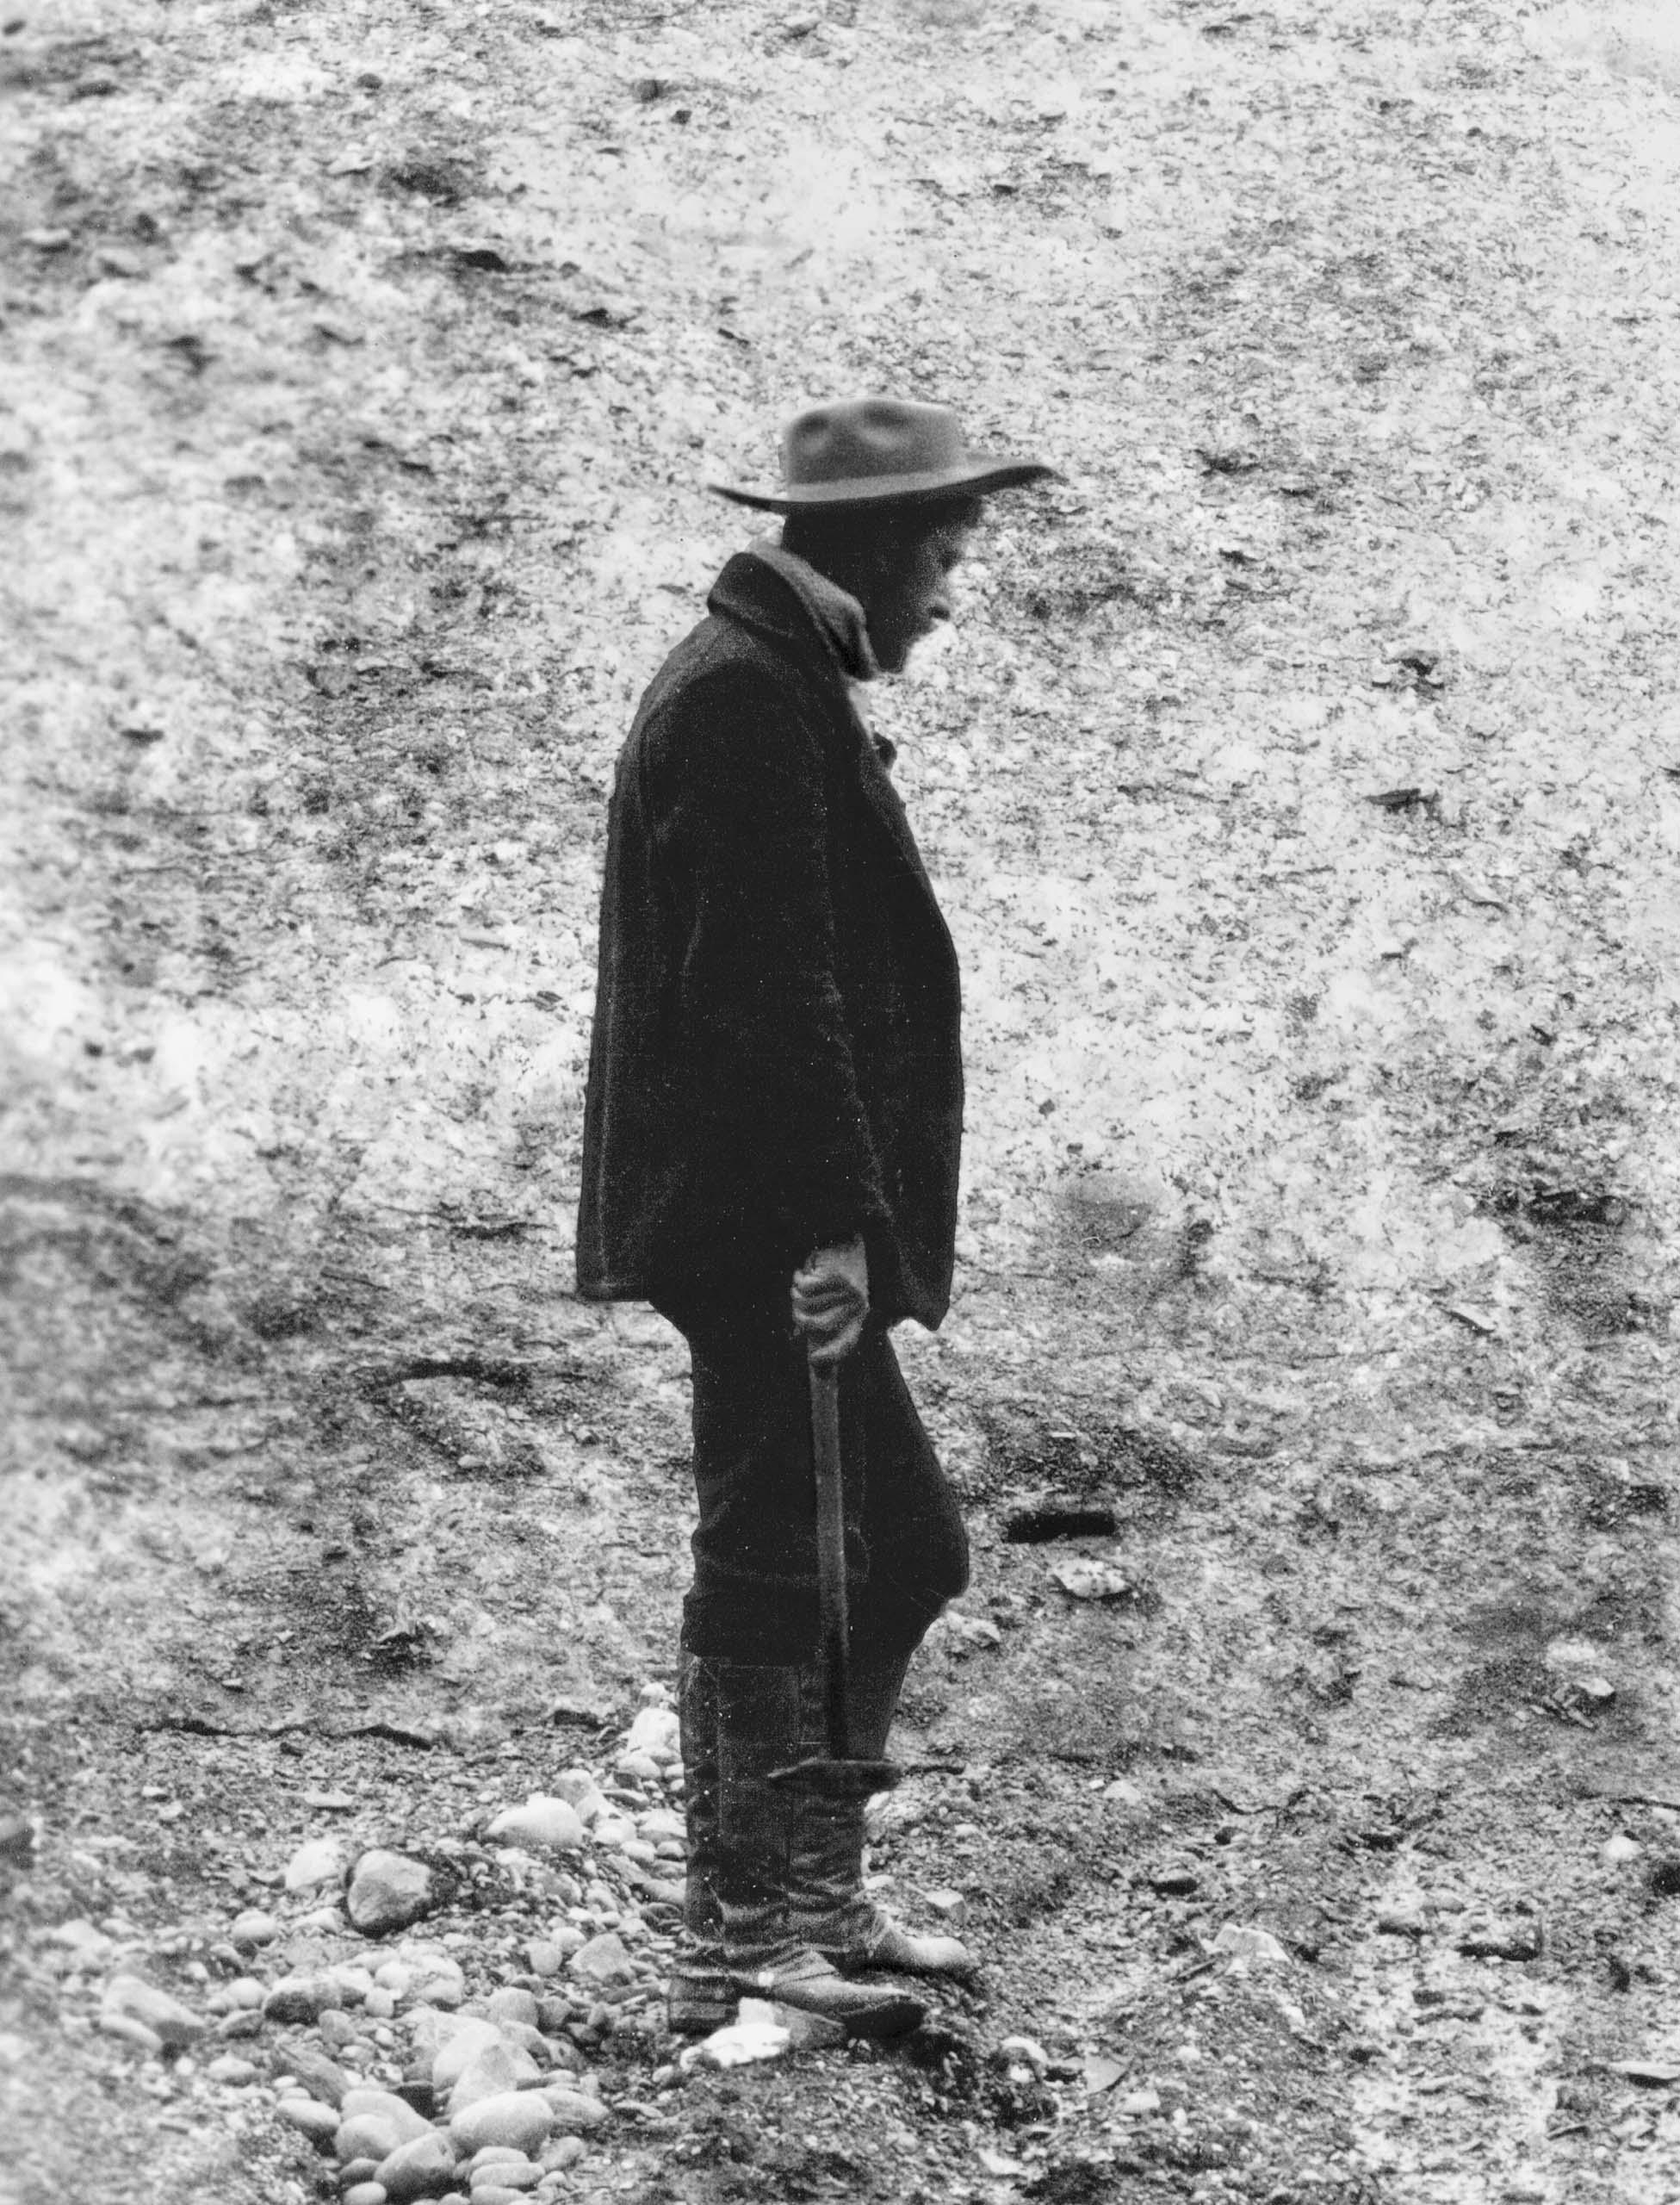 Charles Palache, Chugach Mountains, Alaska, 1899.